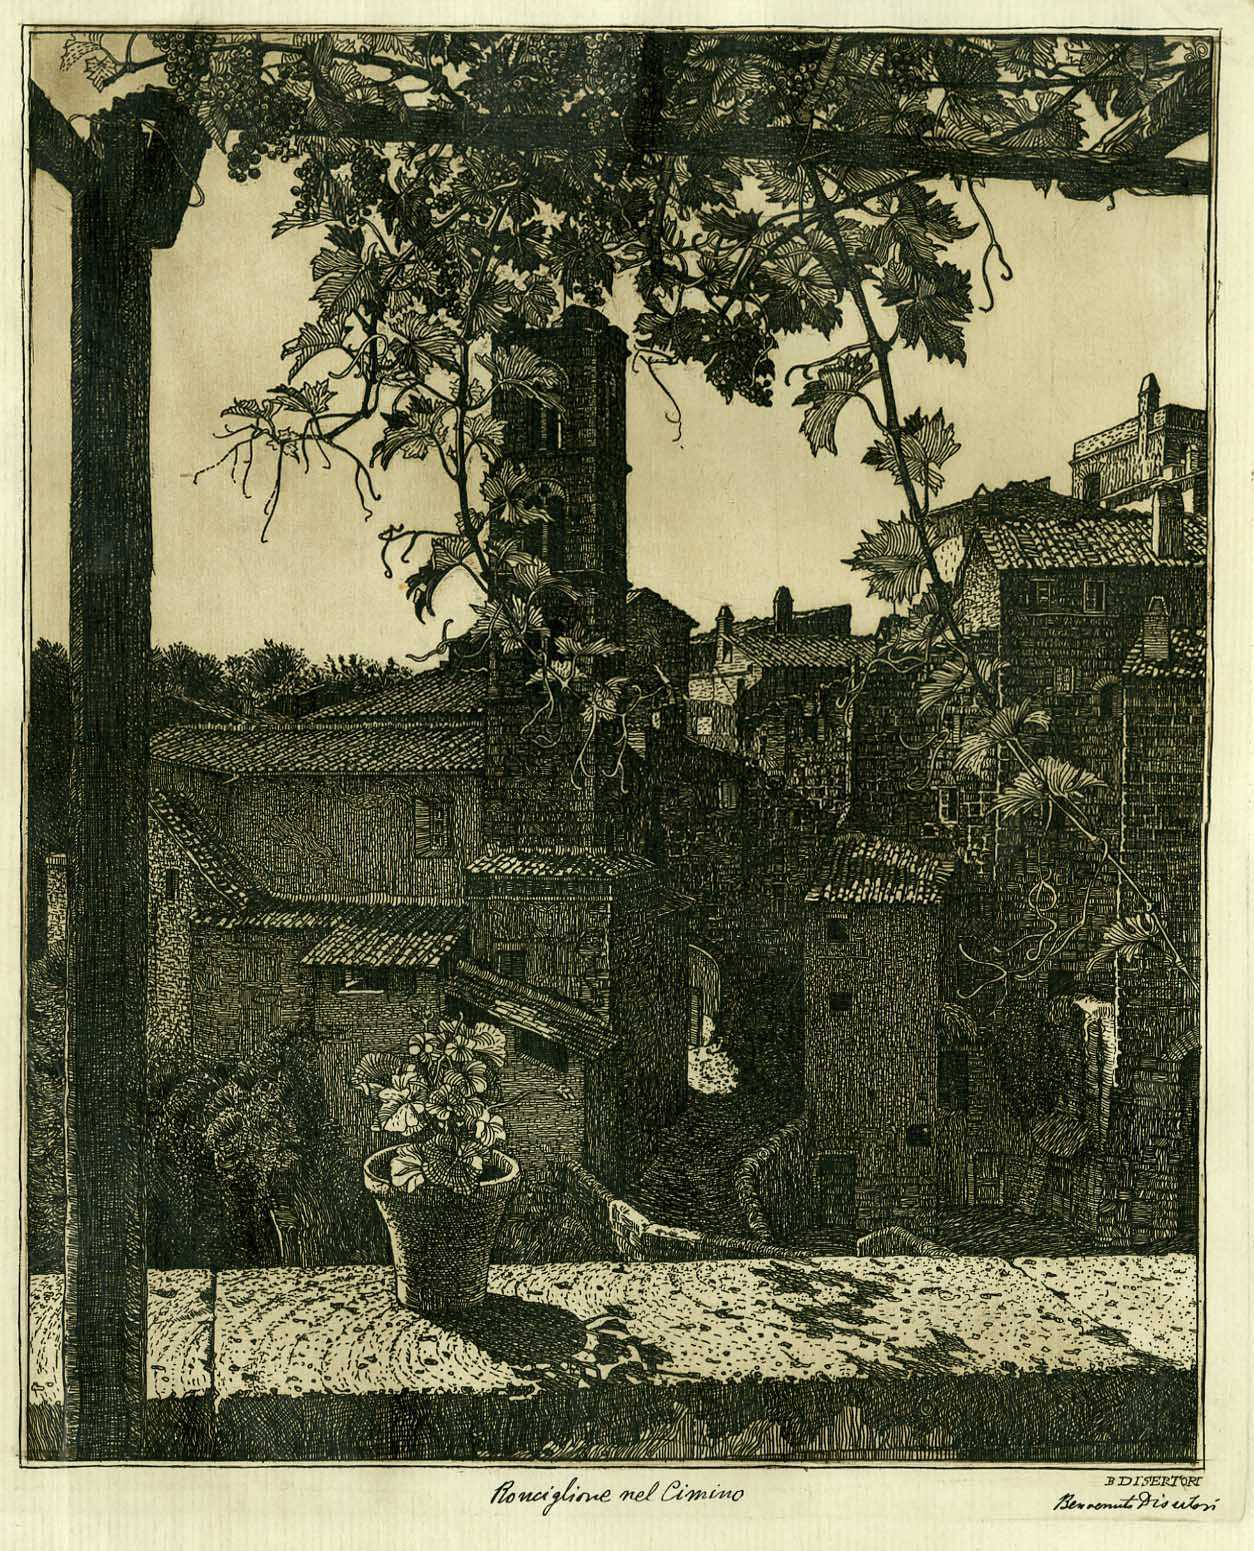 Ronciglione nel Cimino. Veduta n. II (1921-1922).